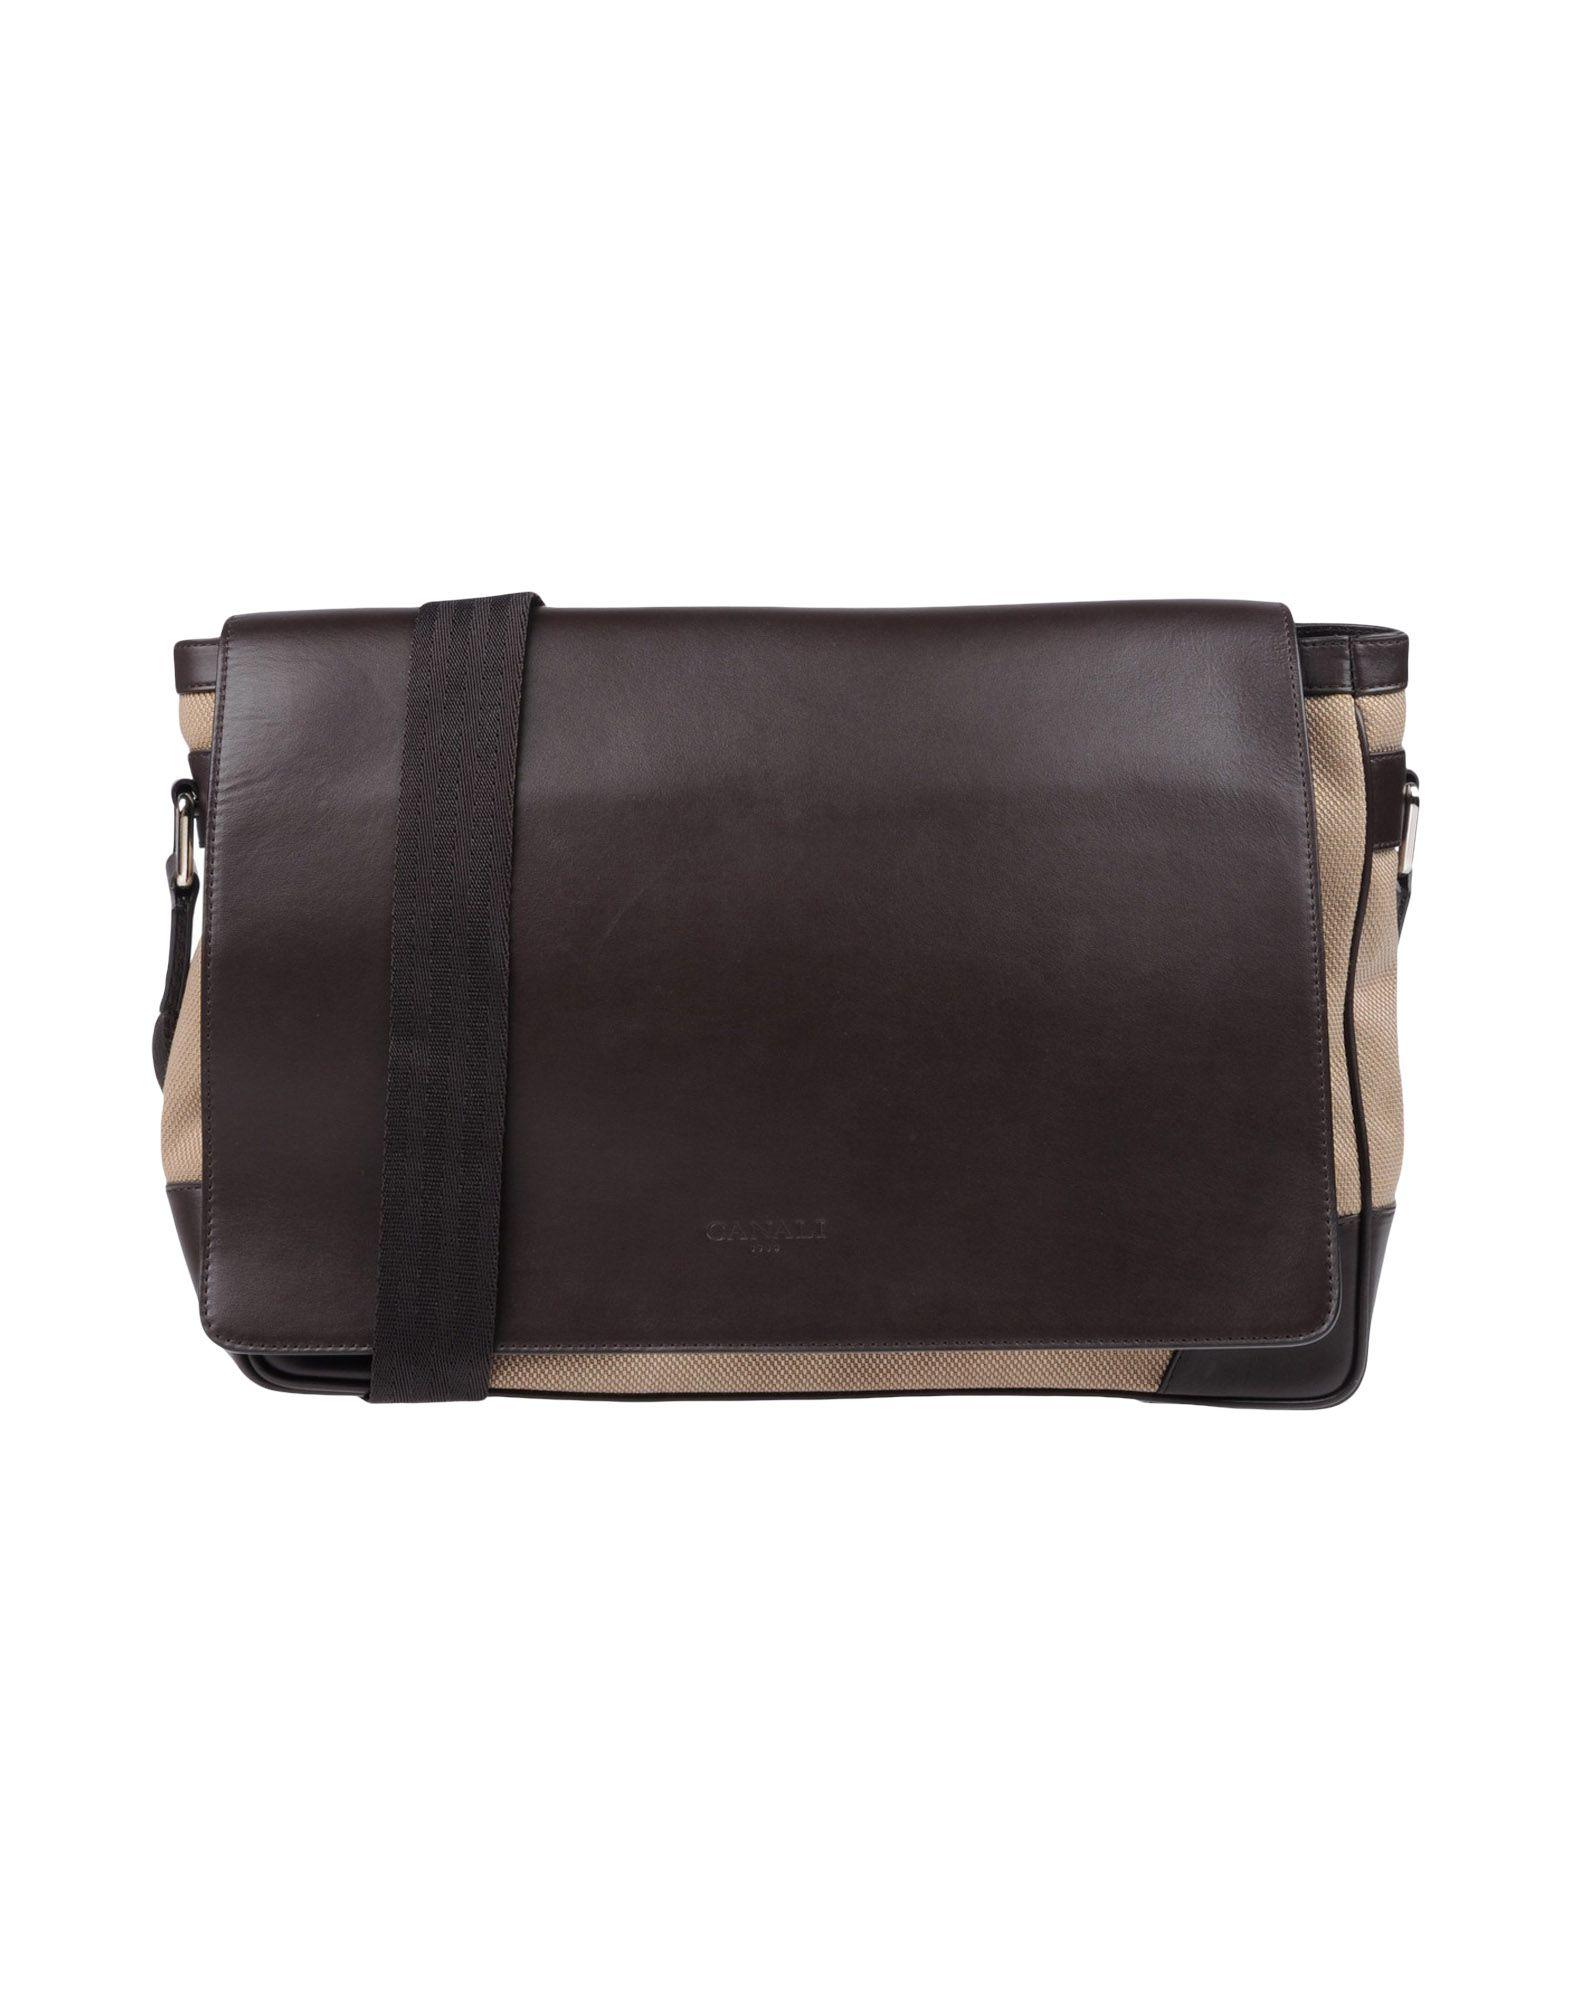 'Canali Handbags